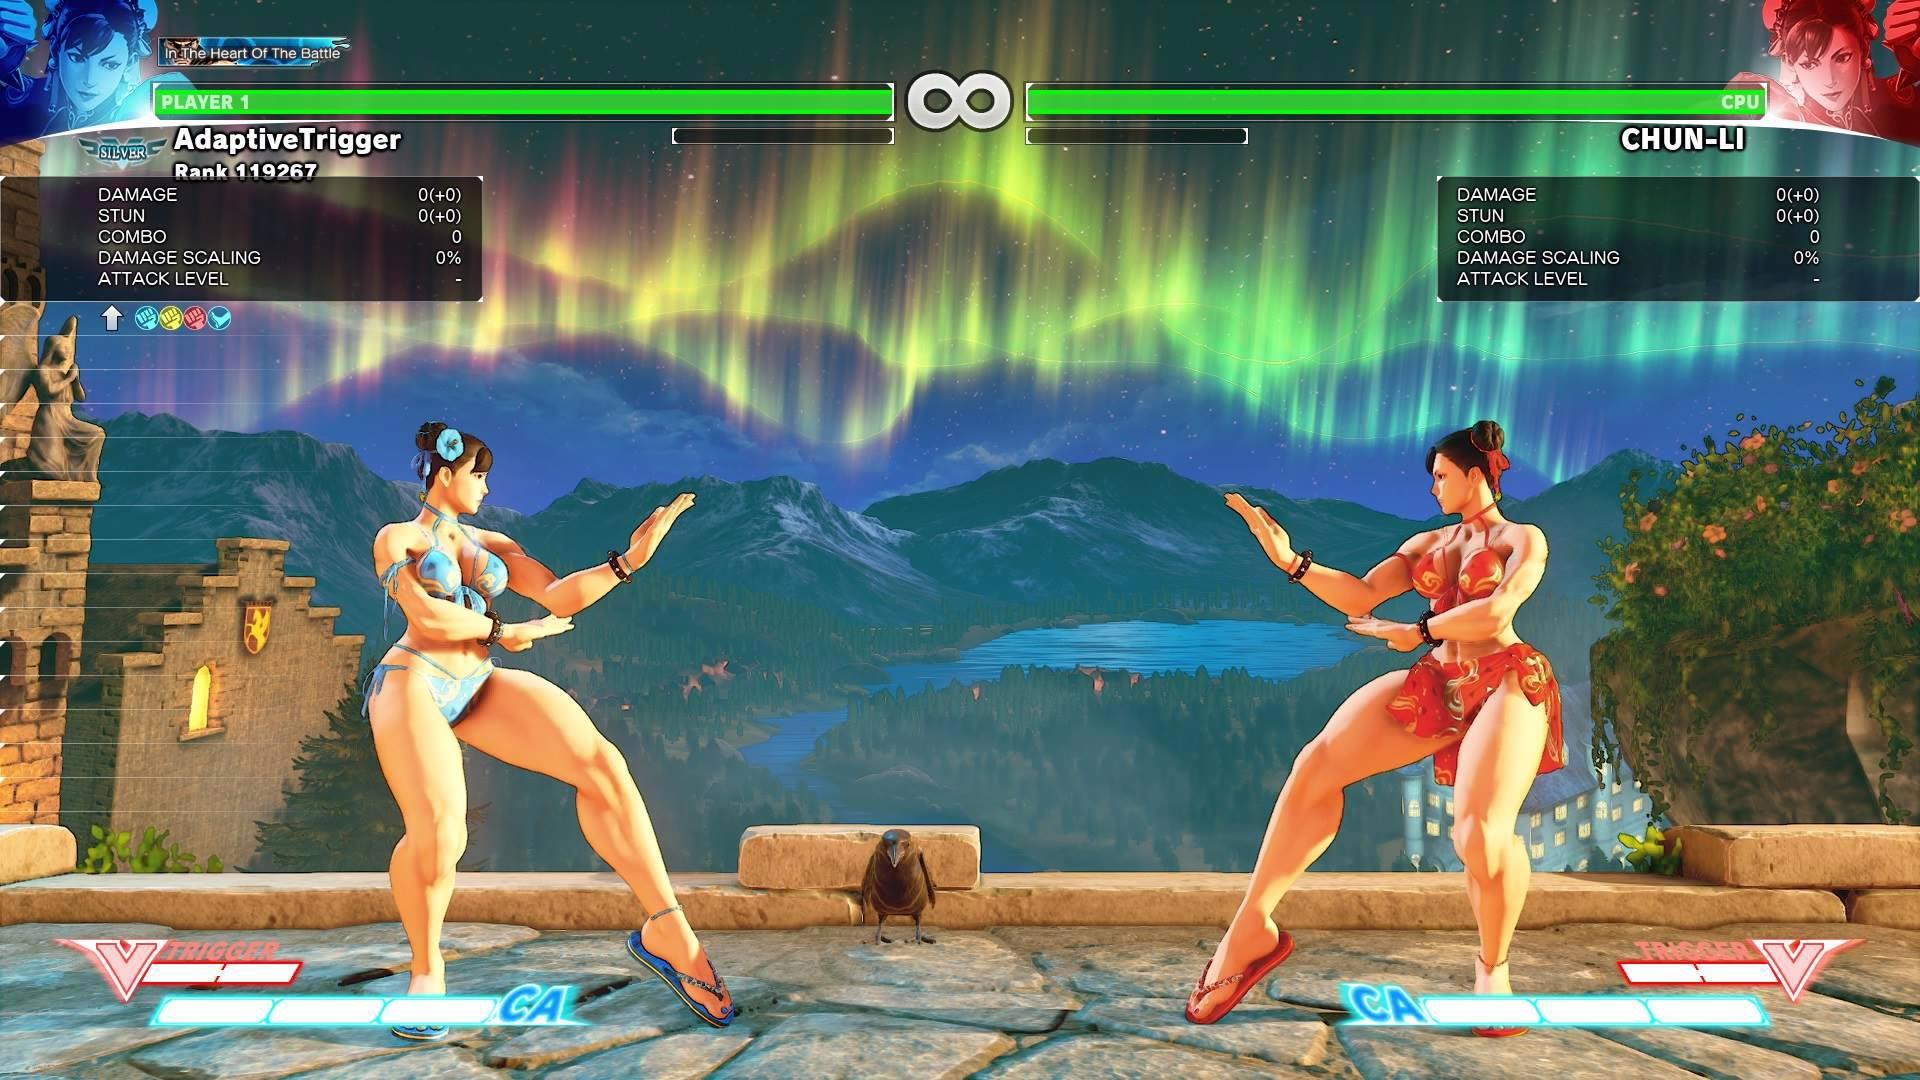 Chun Li S Street Fighter 5 Wardrobe 7 Out Of 13 Image Gallery